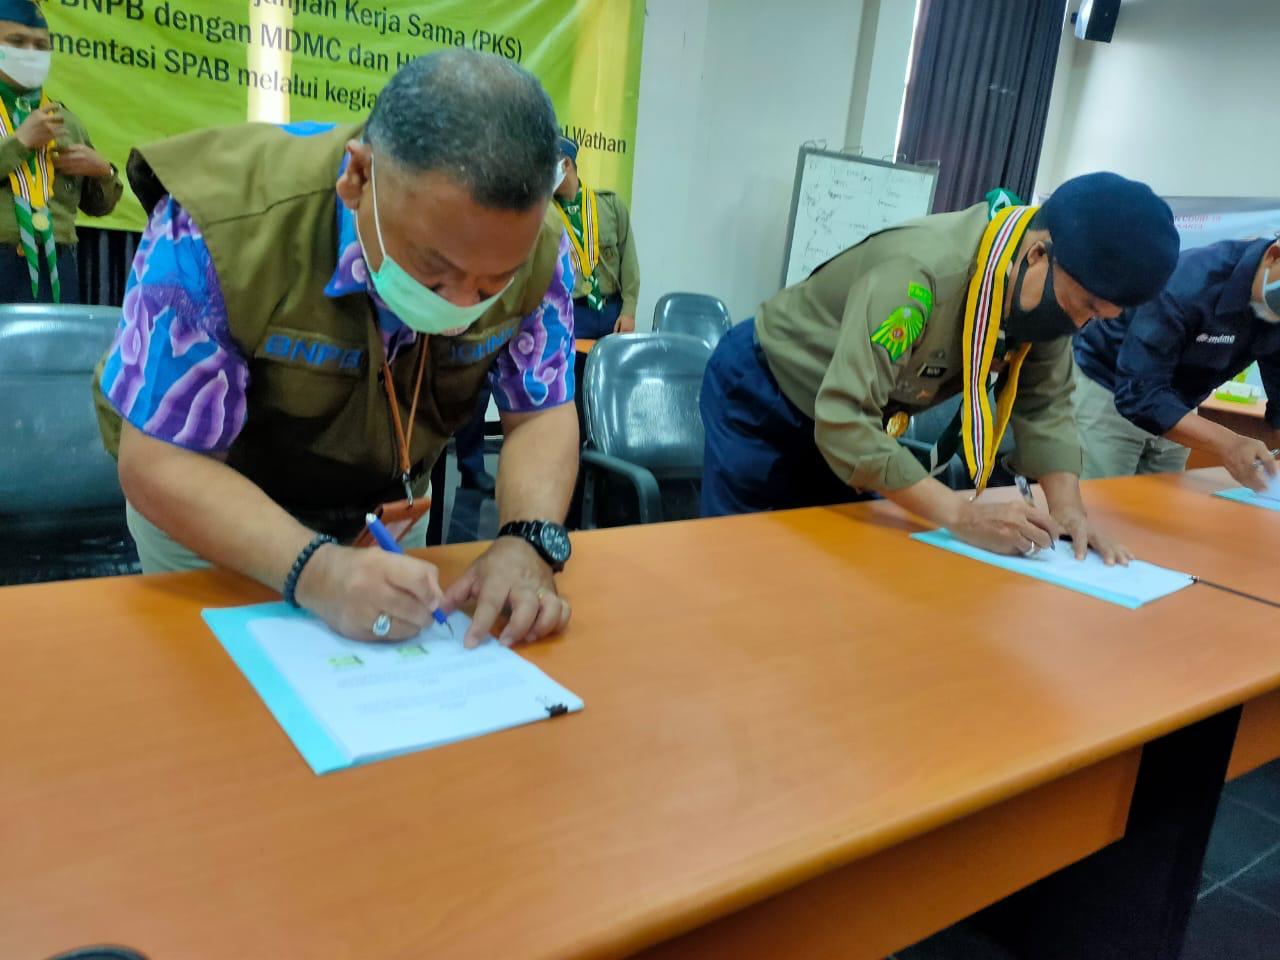 Kerja sama BNPB dengan MDMC dan Hizbul Wathan Implementasikan SPAB